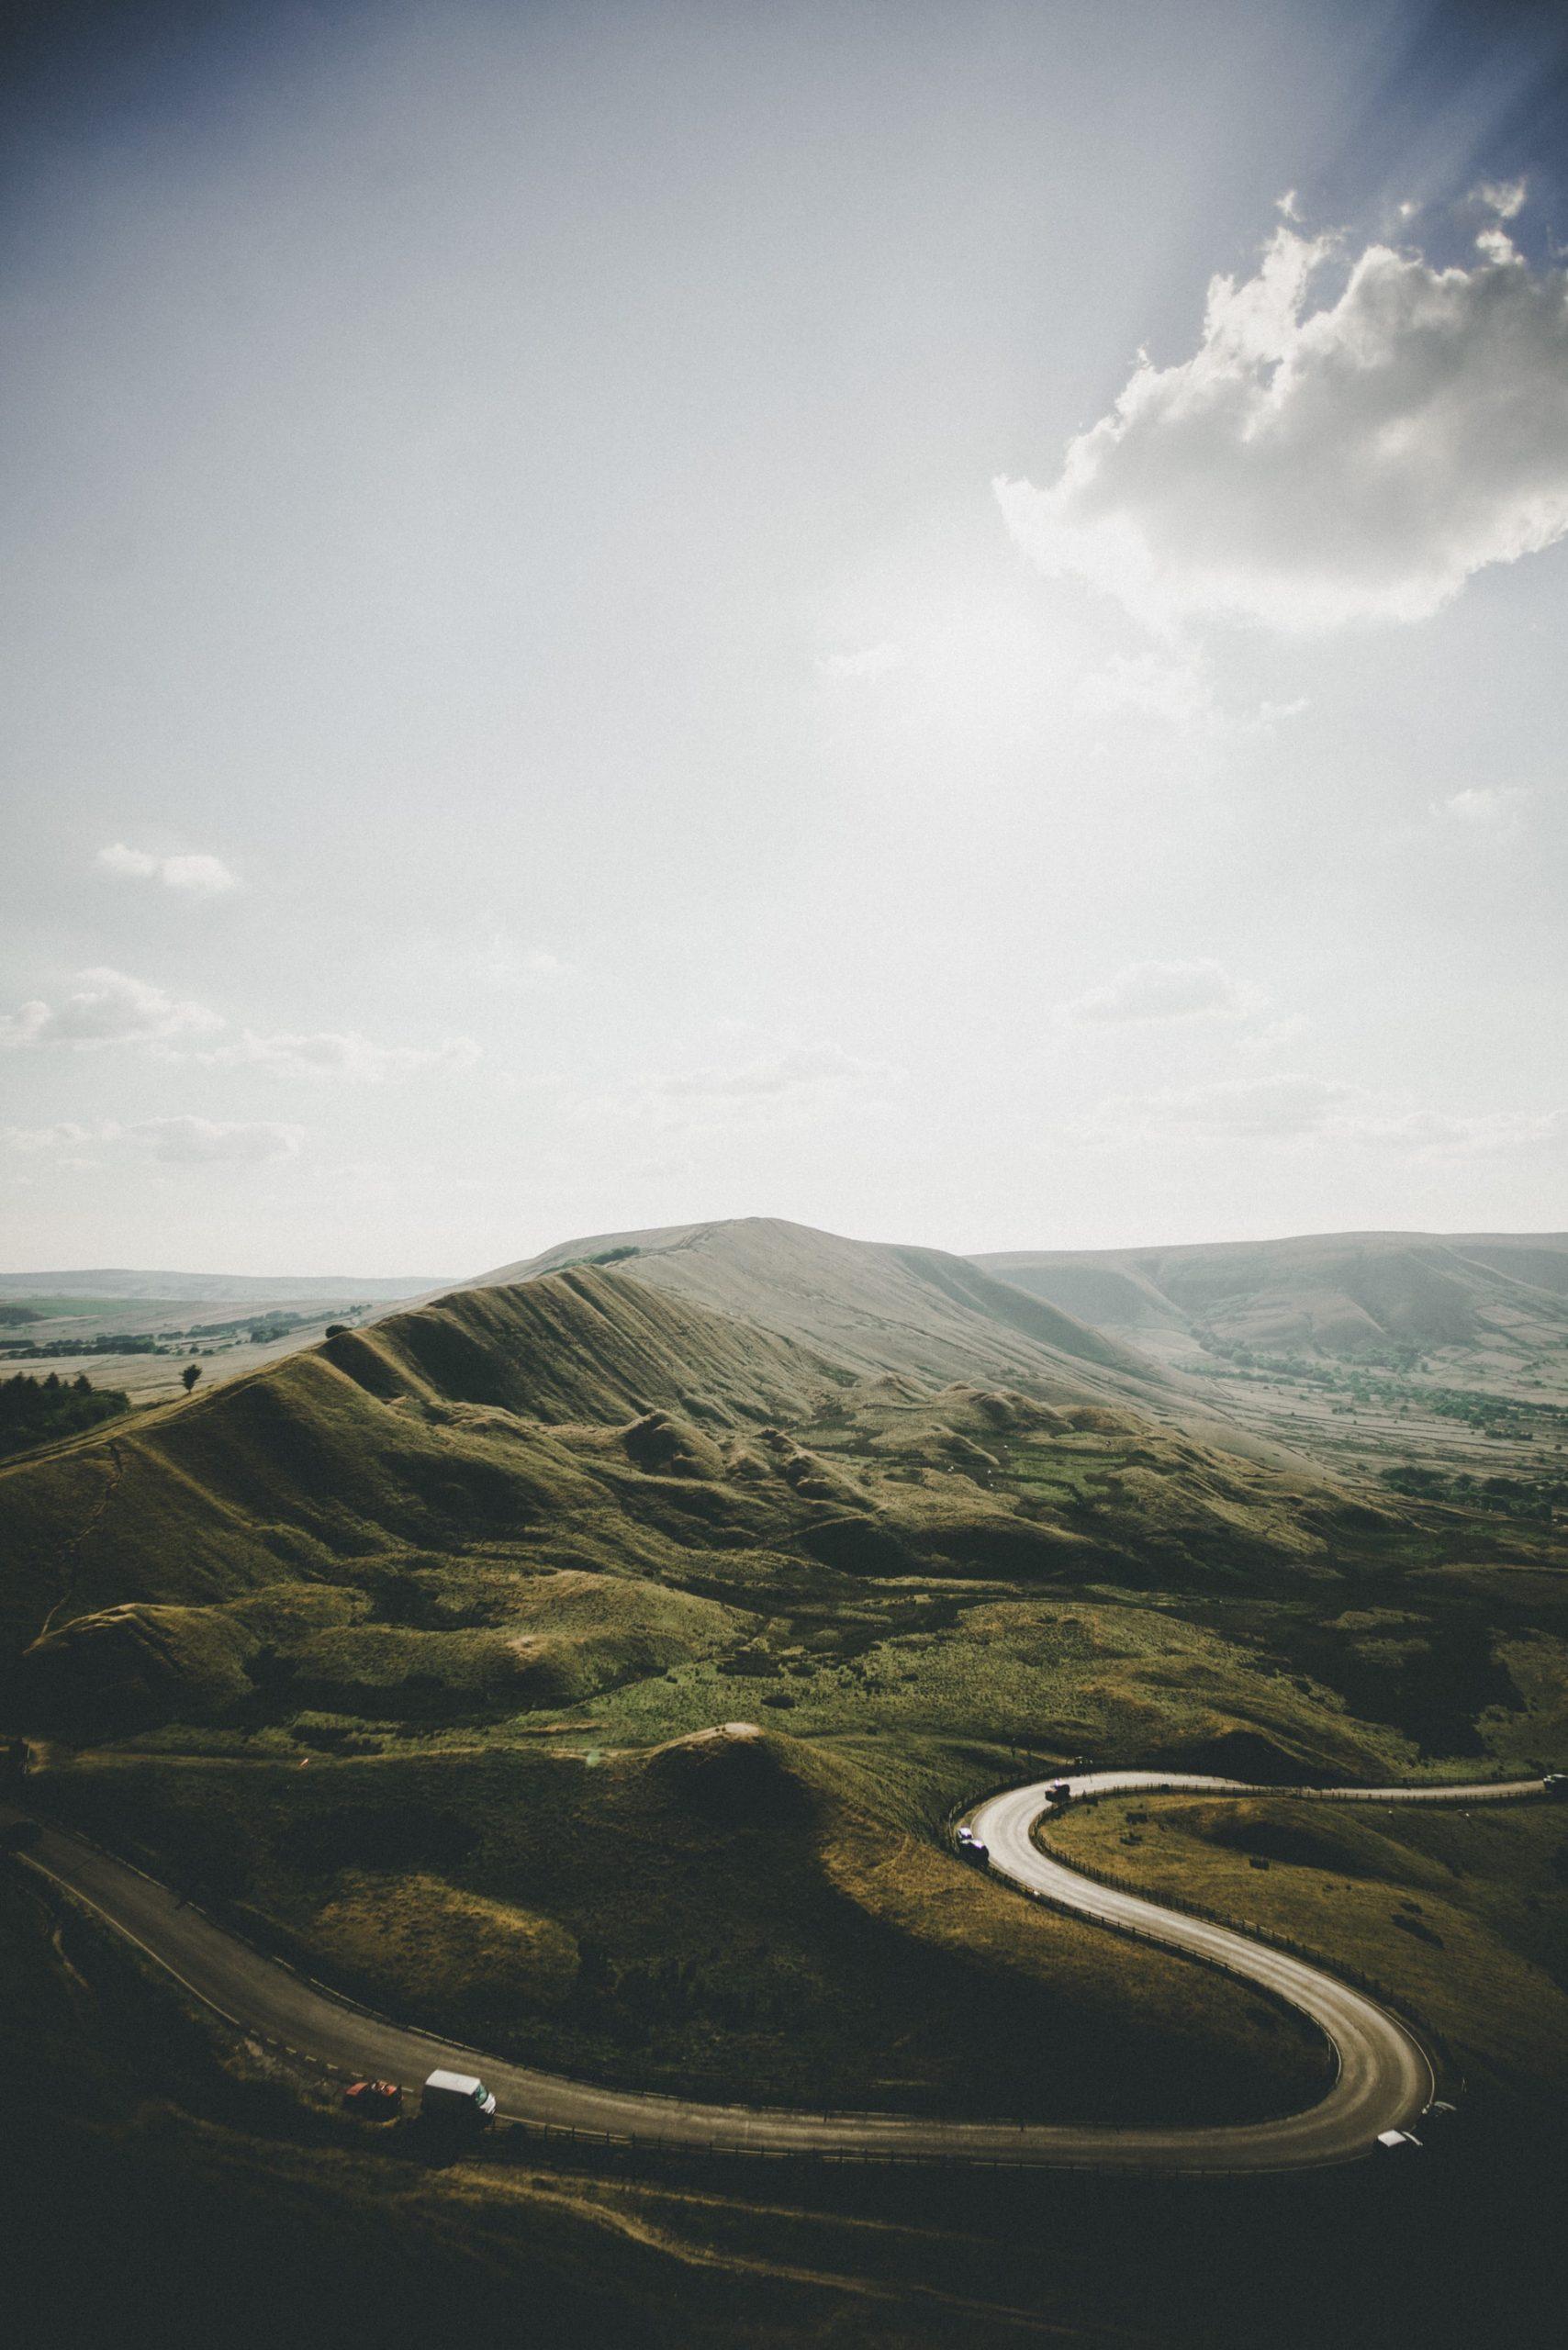 road-mountain